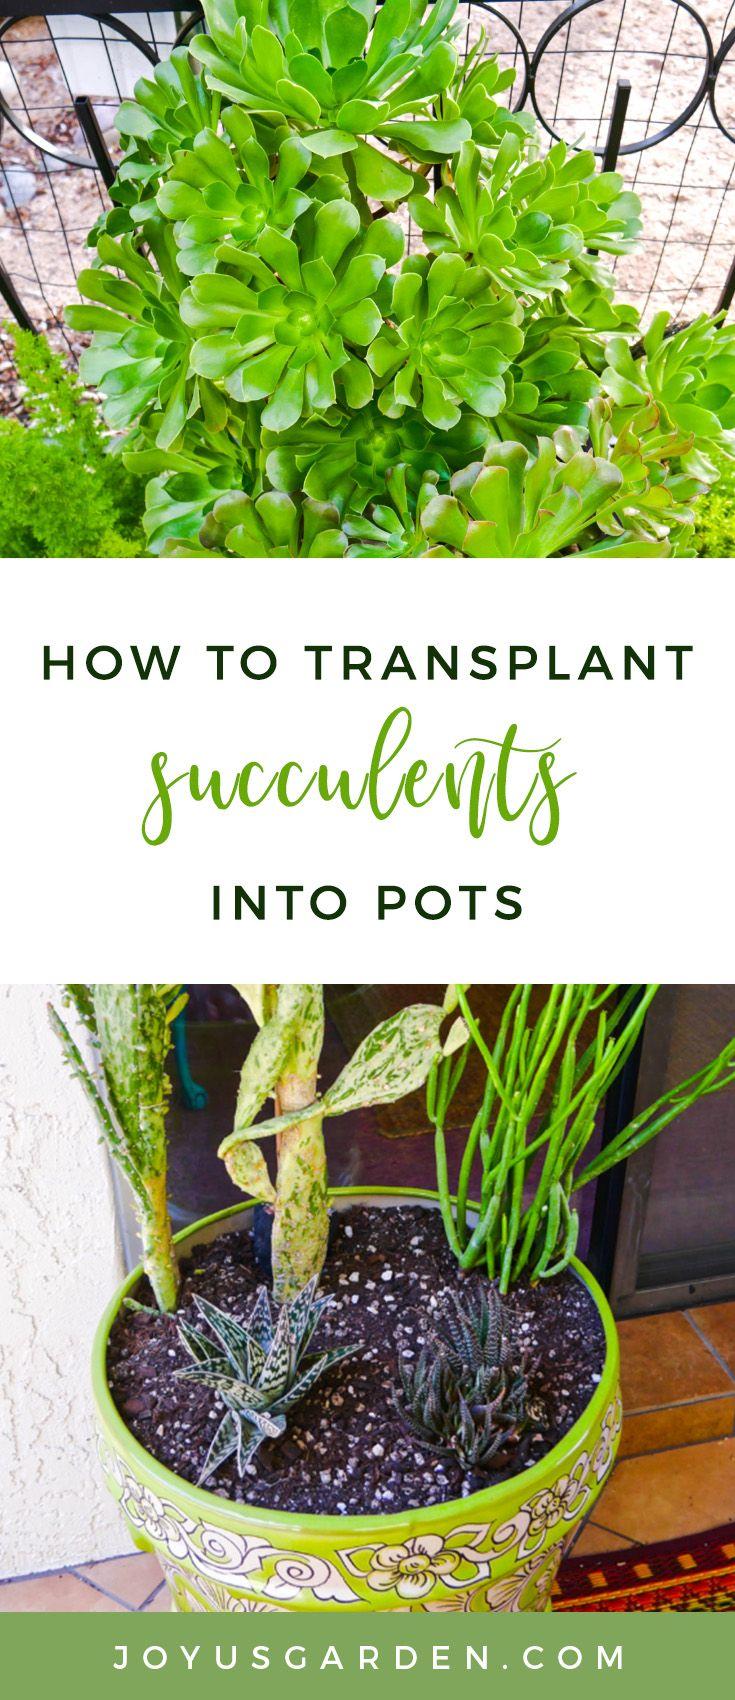 How To Transplant Succulents Into Pots Joy Us Garden Transplant Succulents Plants Succulents